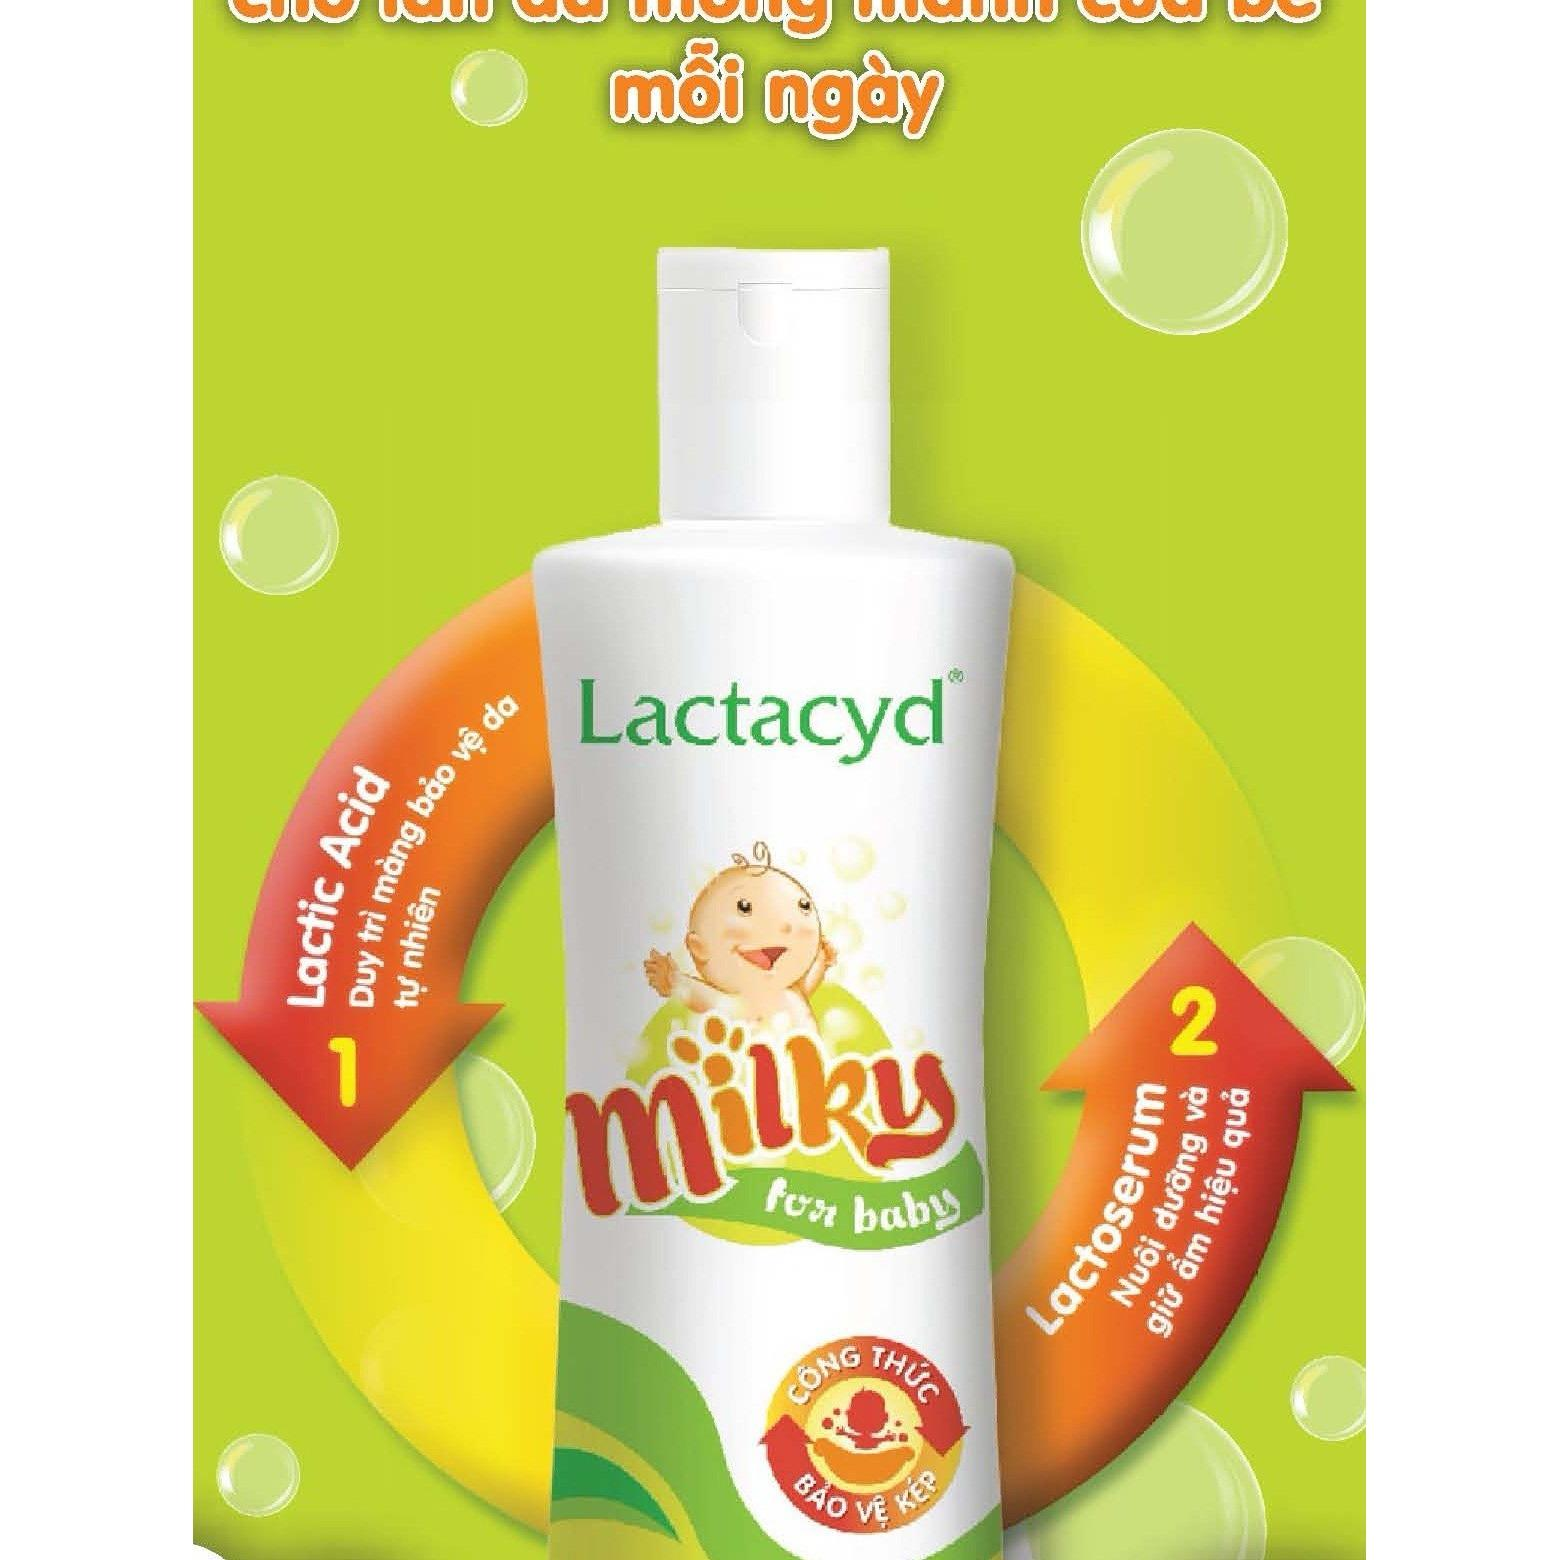 Sữa tắm trẻ em Lactacyd Milky 500ml